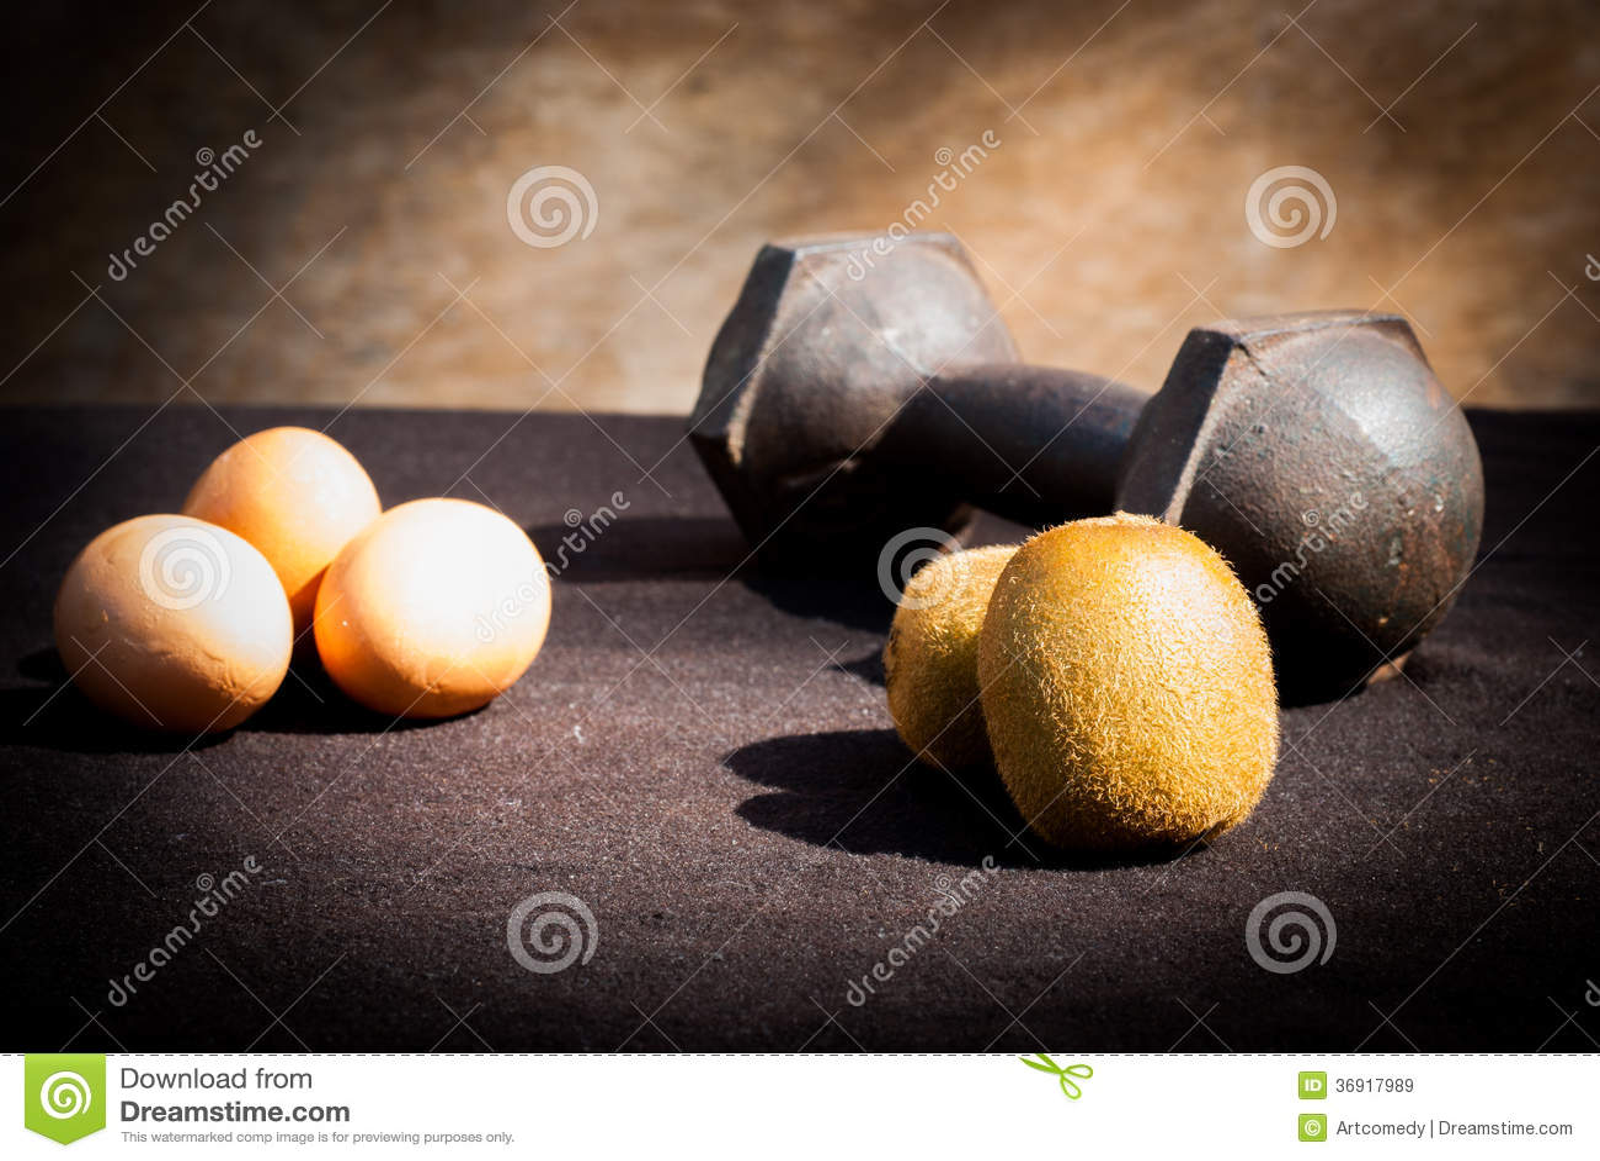 Jajka, kiwi i dumbbells dla trenować,